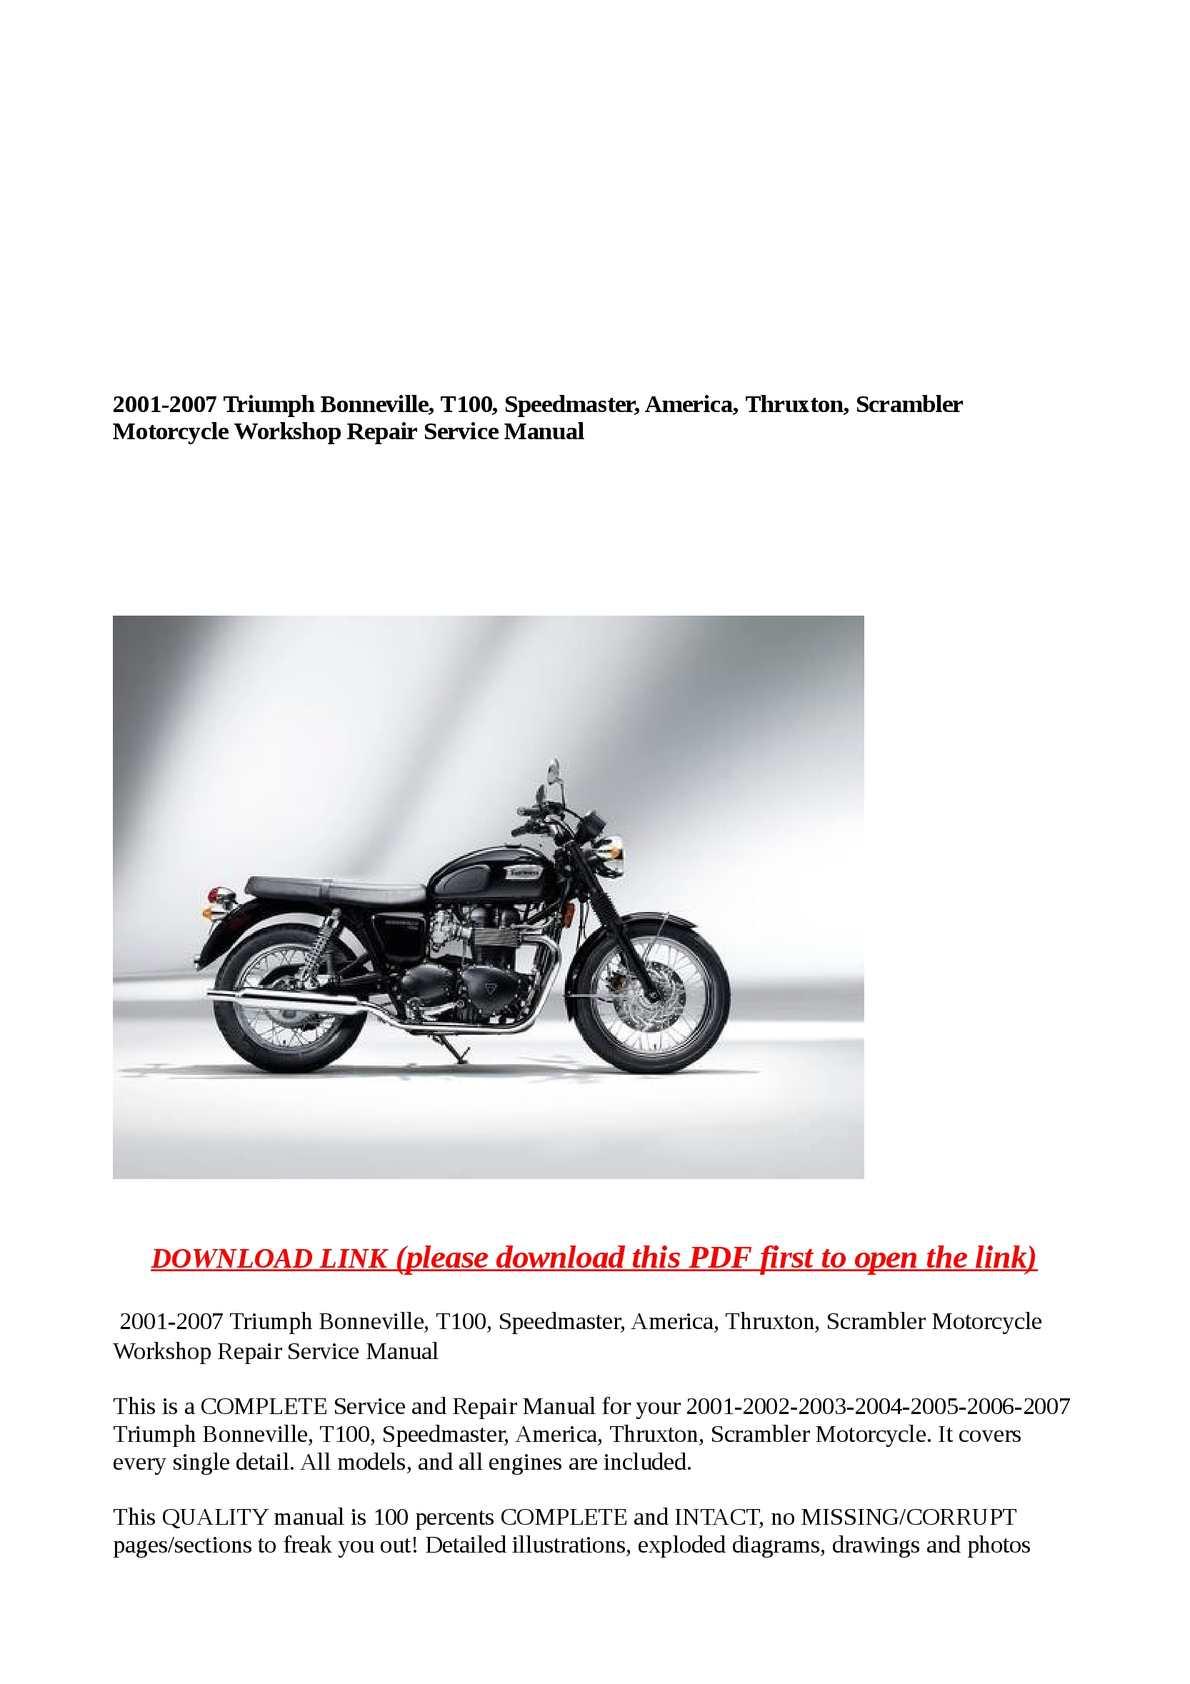 triumph bonneville t100 service manual free pdf